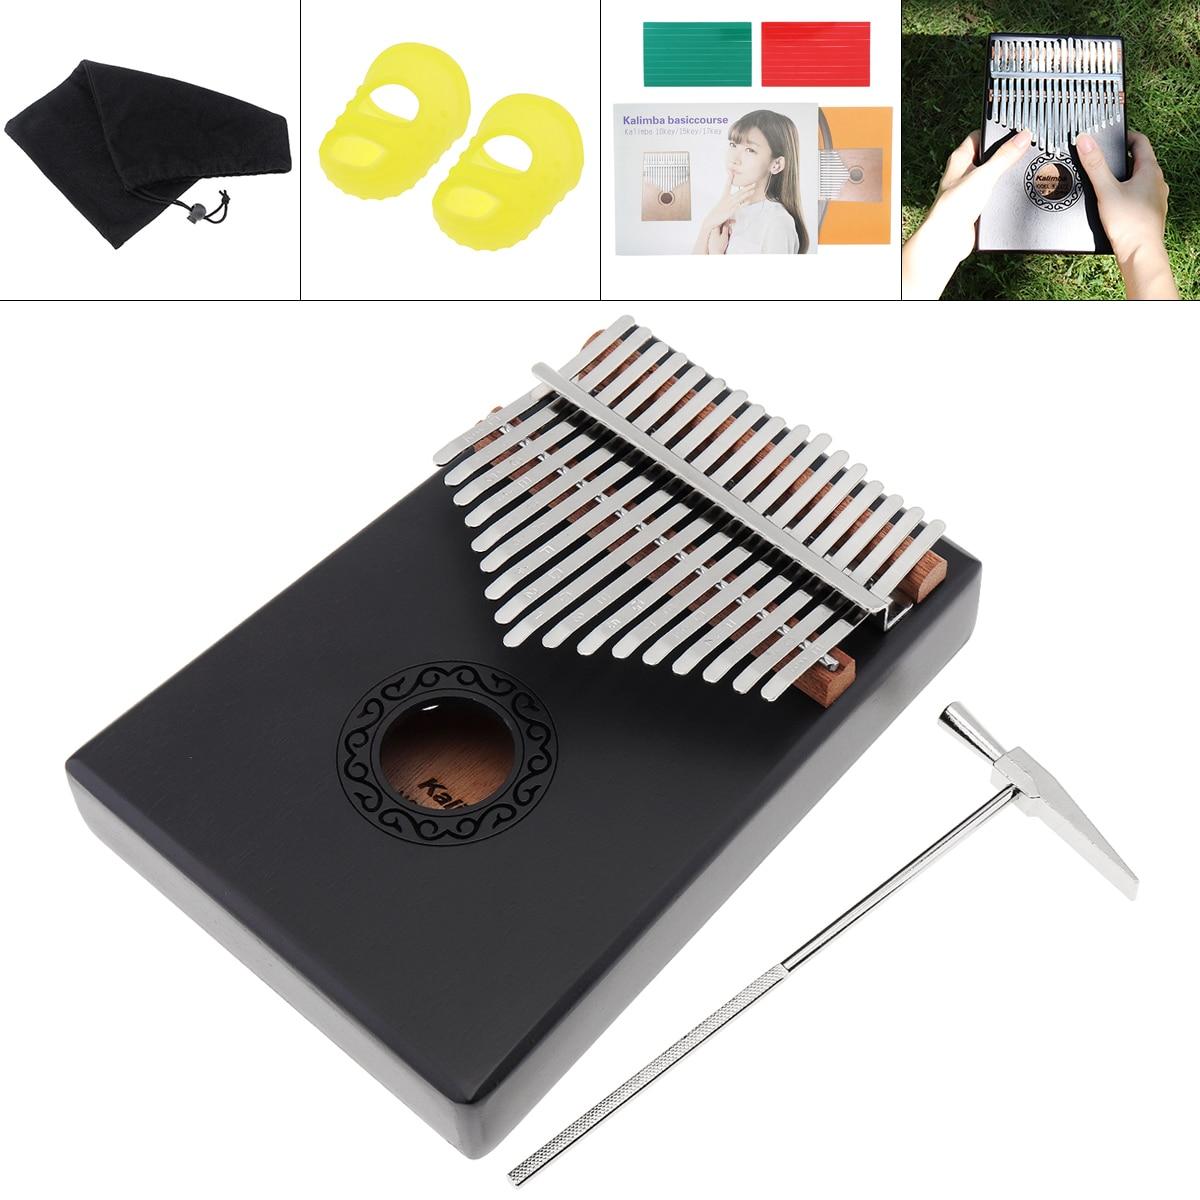 17 Key Kalimba Single Board Mahogany Thumb Piano Mbira Mini Keyboard Instrument With Complete Accessories